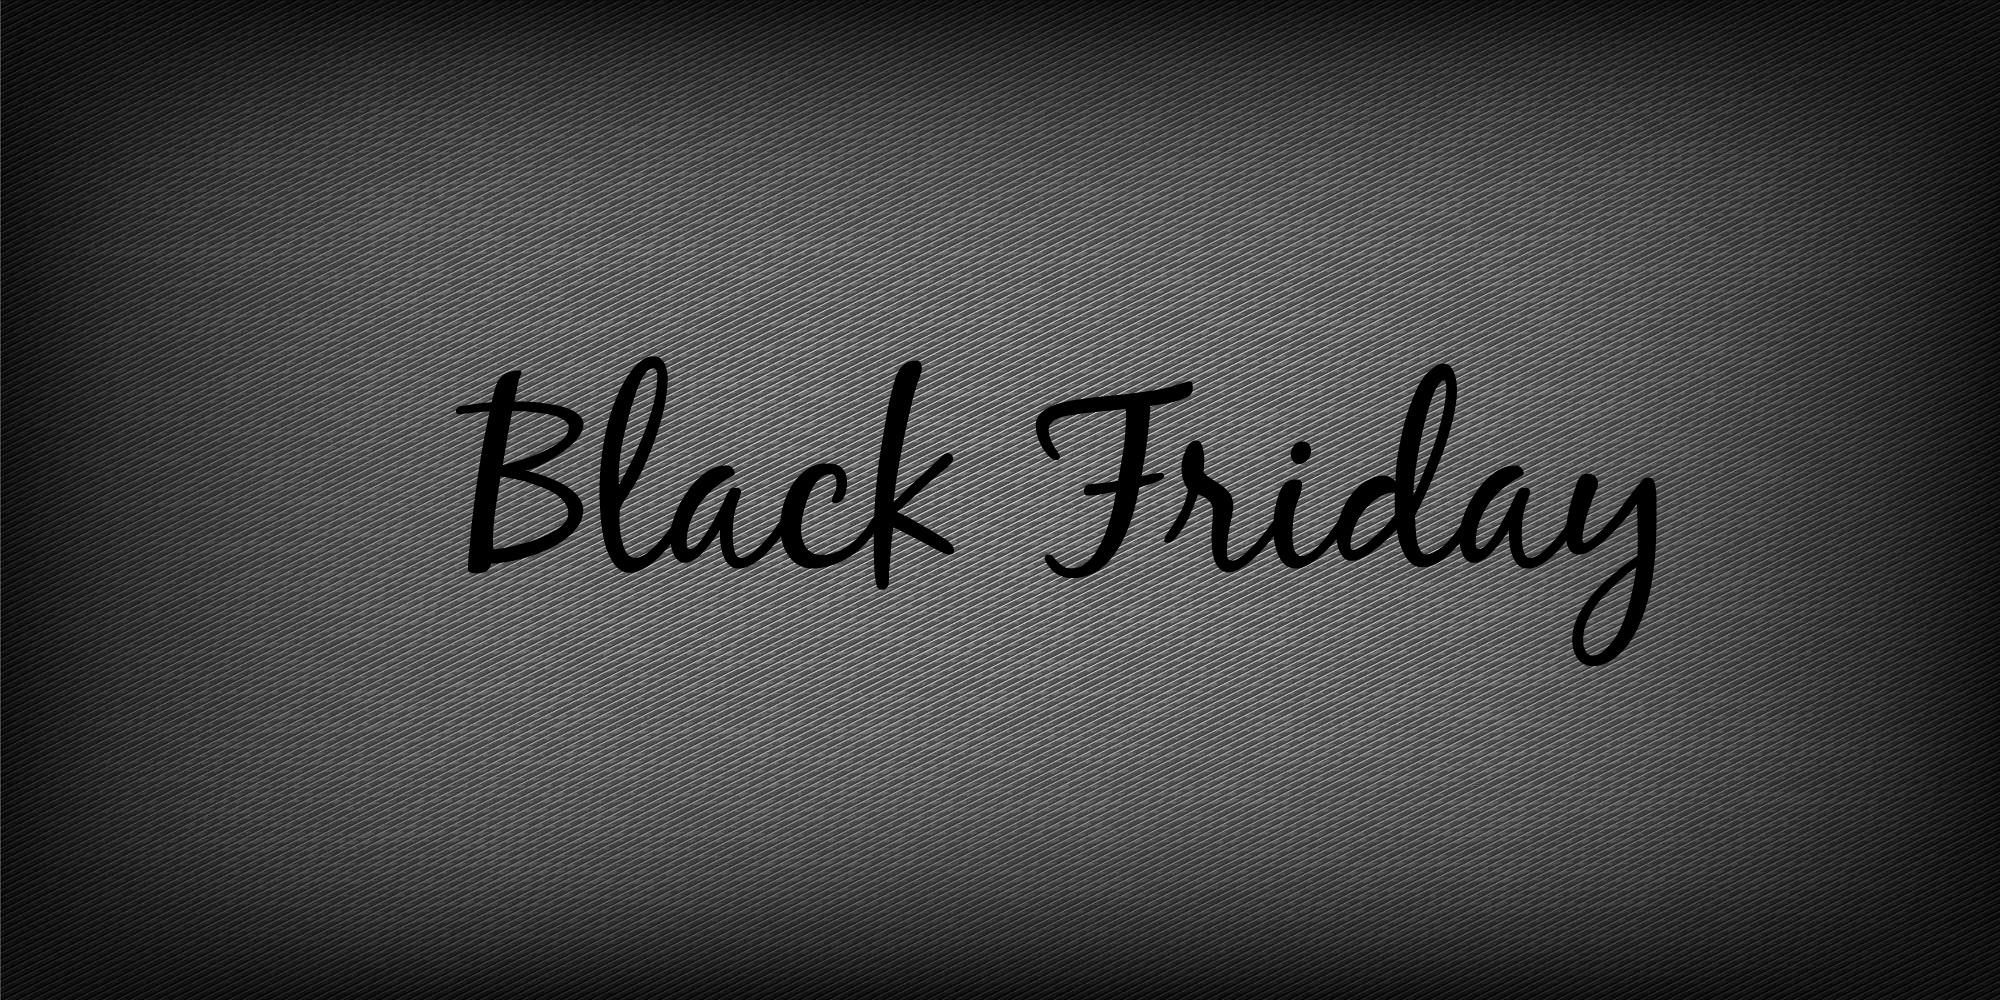 November 27th – Black Friday